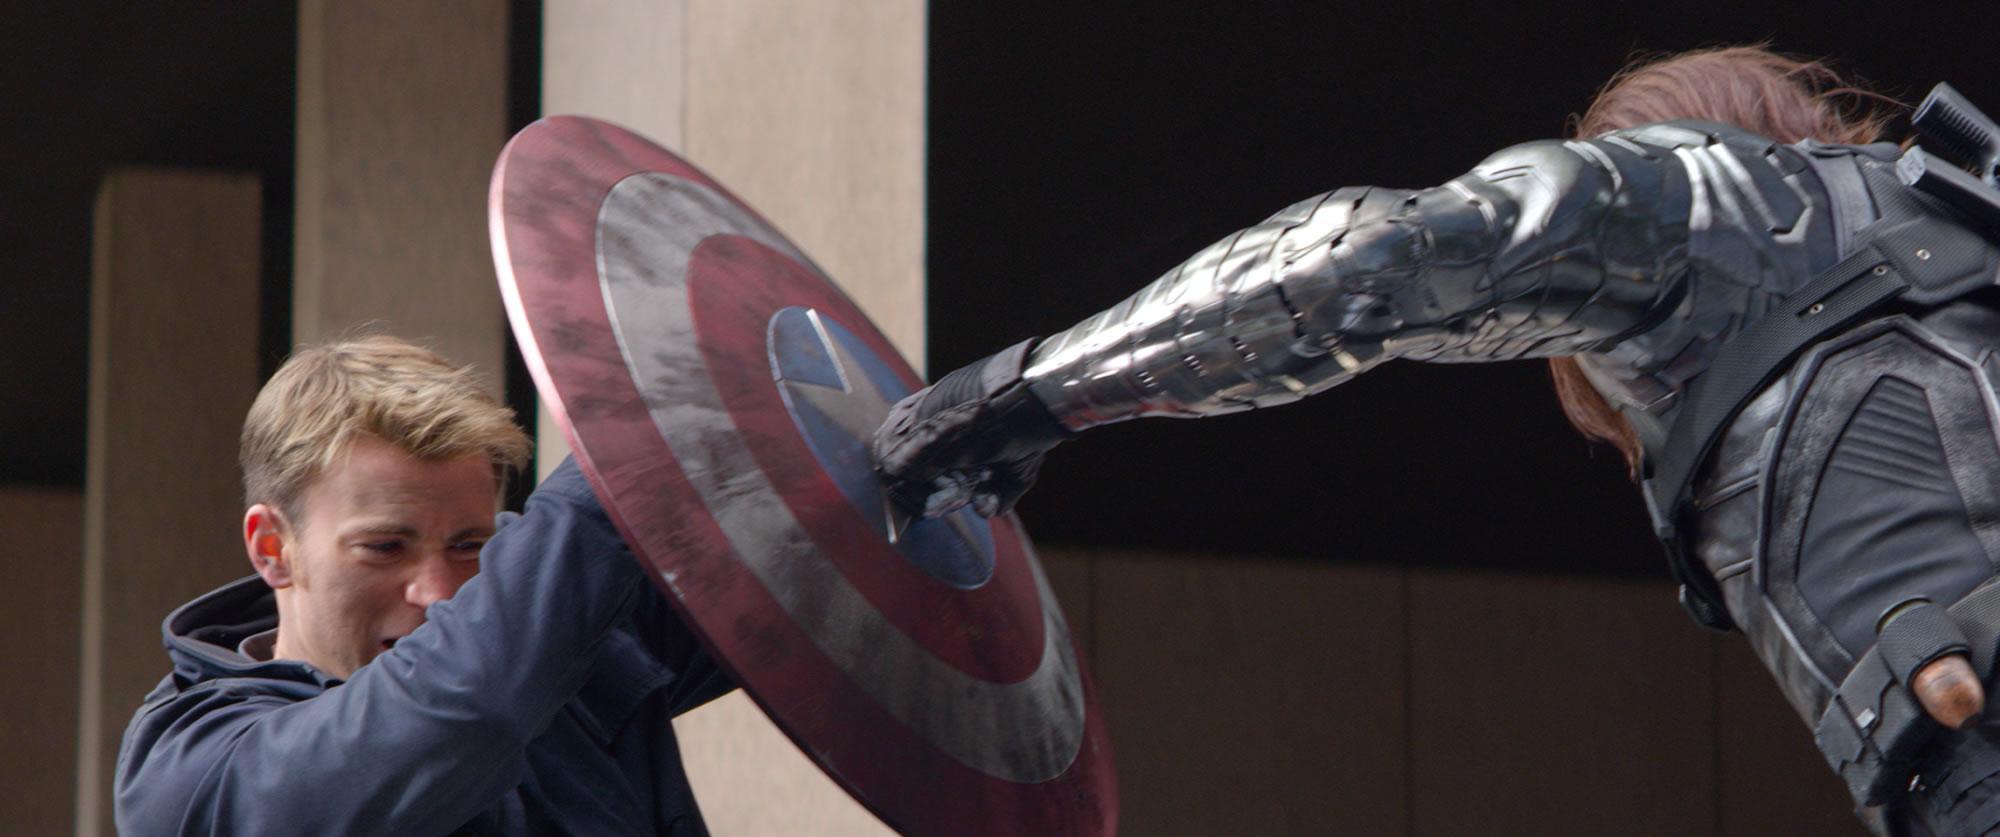 captain america winter soldier chris evans shield punch